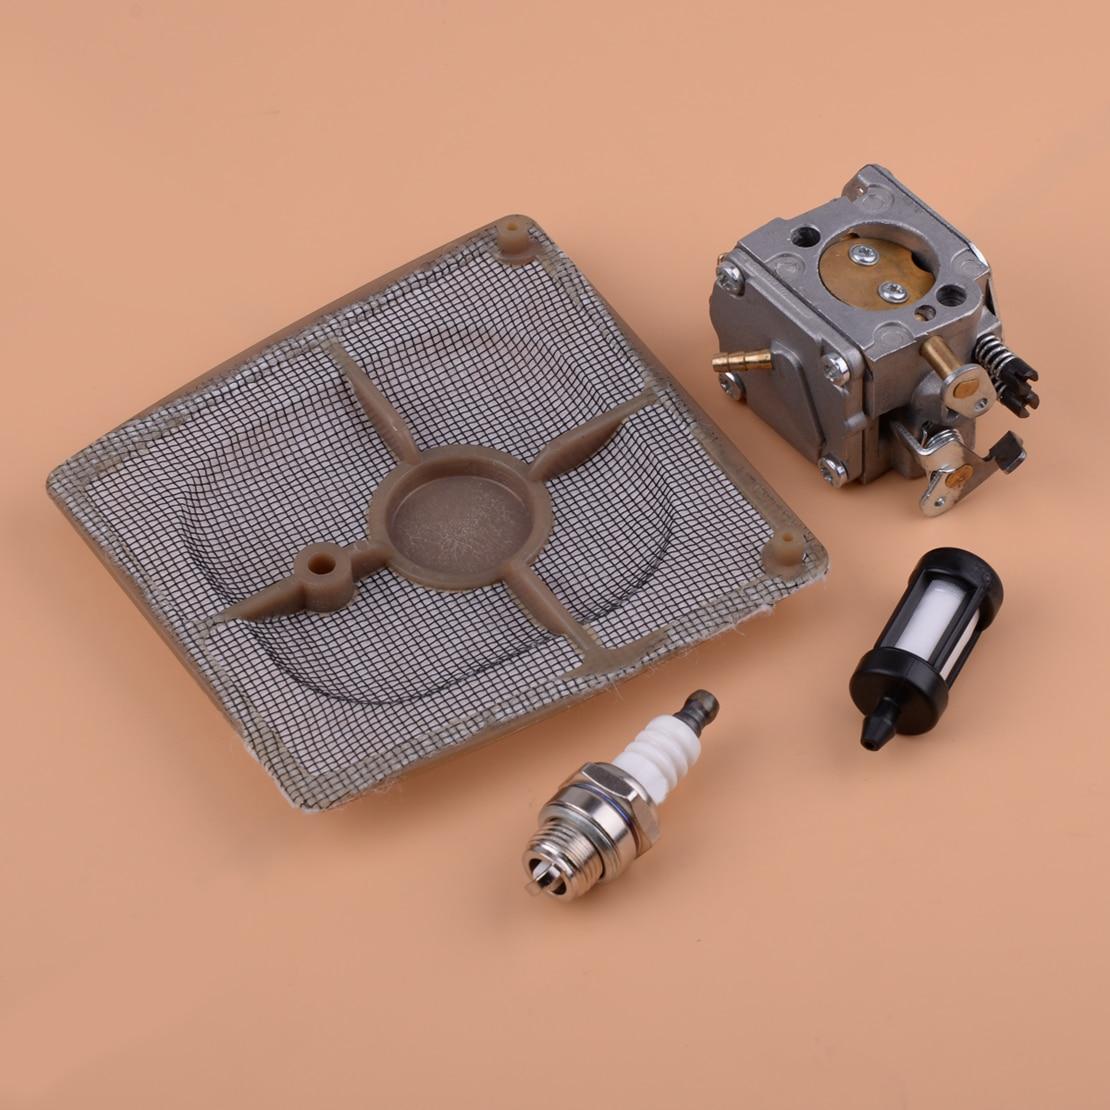 LETAOSK New Carburetor Carb & Air Fuel Line Filter Spark Plug Fit For STIHL 041 Farm Boss Gas Carb Chainsaw